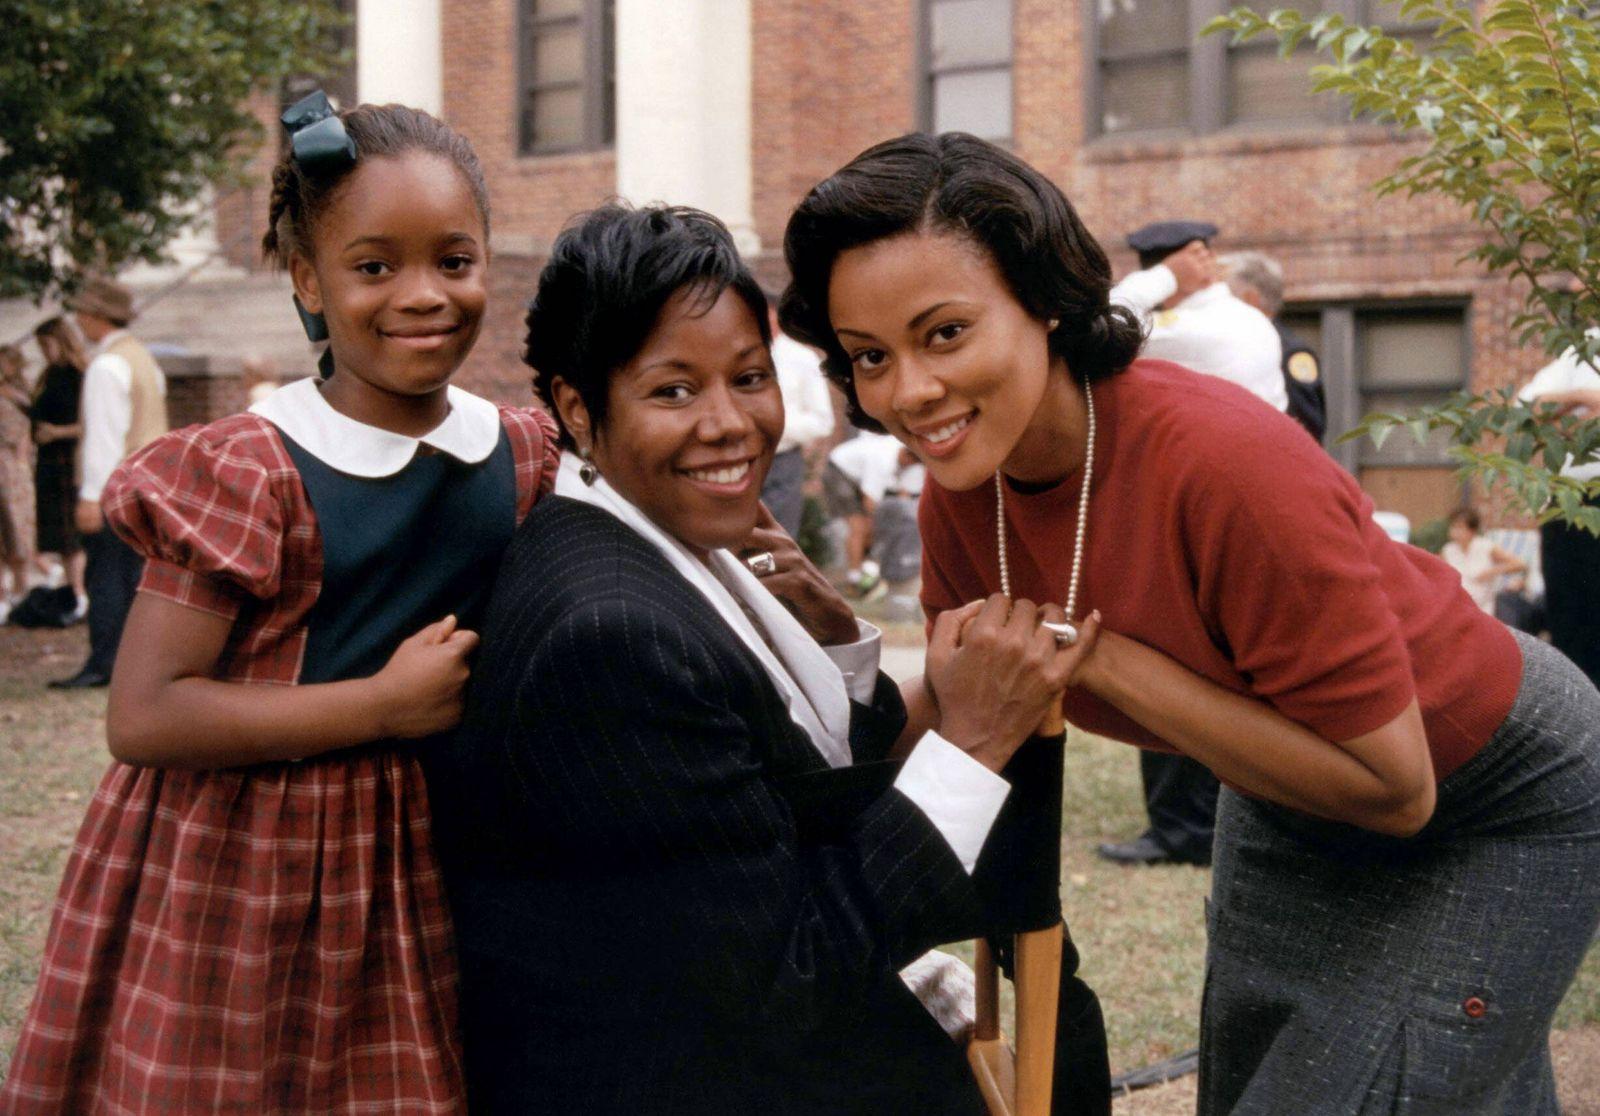 RUBY BRIDGES, Chaz Monet, Ruby Bridges Hall, Lela Rochon on-set, 1998. Walt Disney Television / Courtesy: Everett Collec